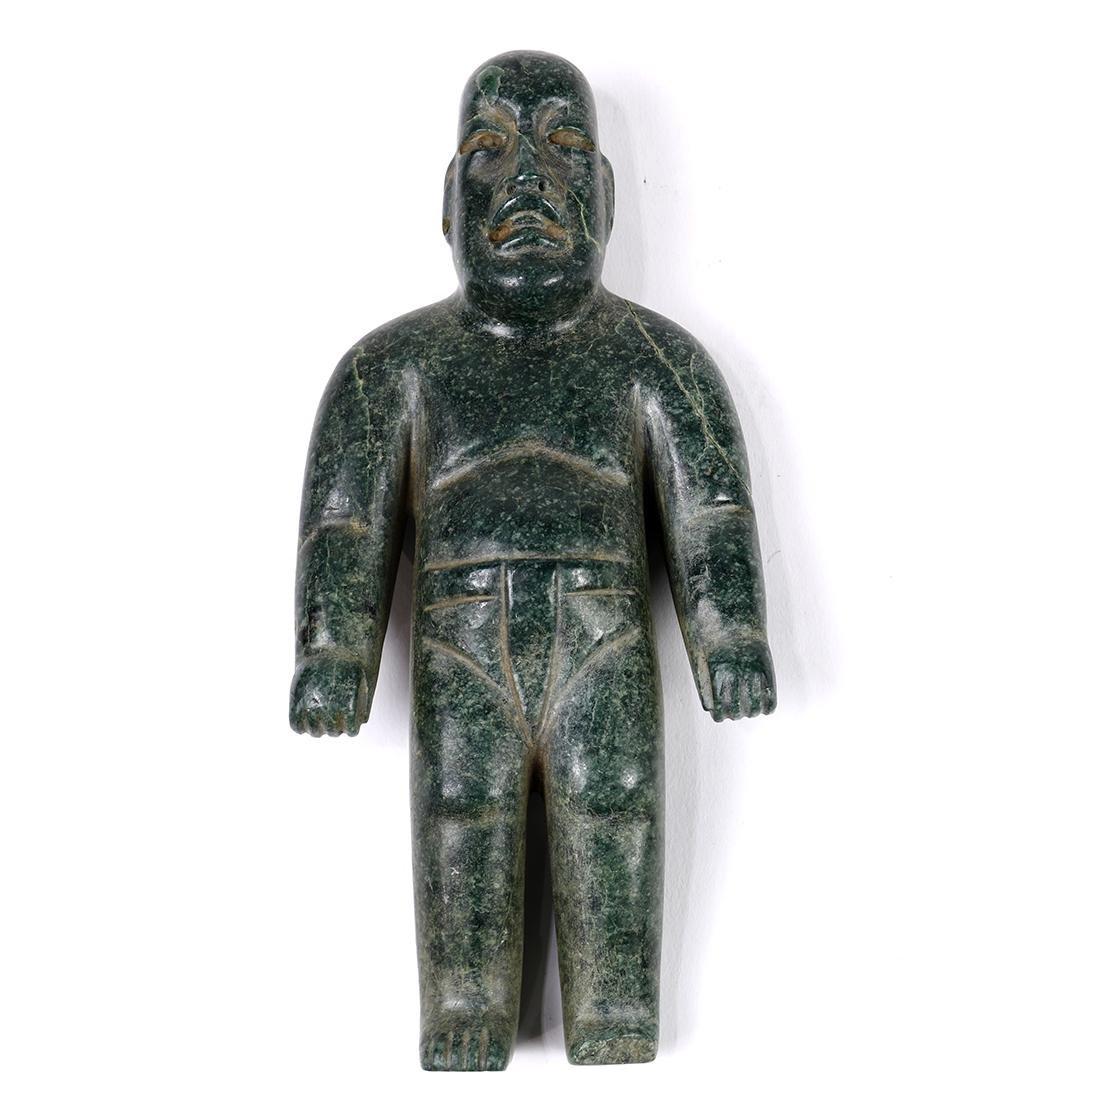 Pre-Columbian or Olmec style jade figure, depicting a